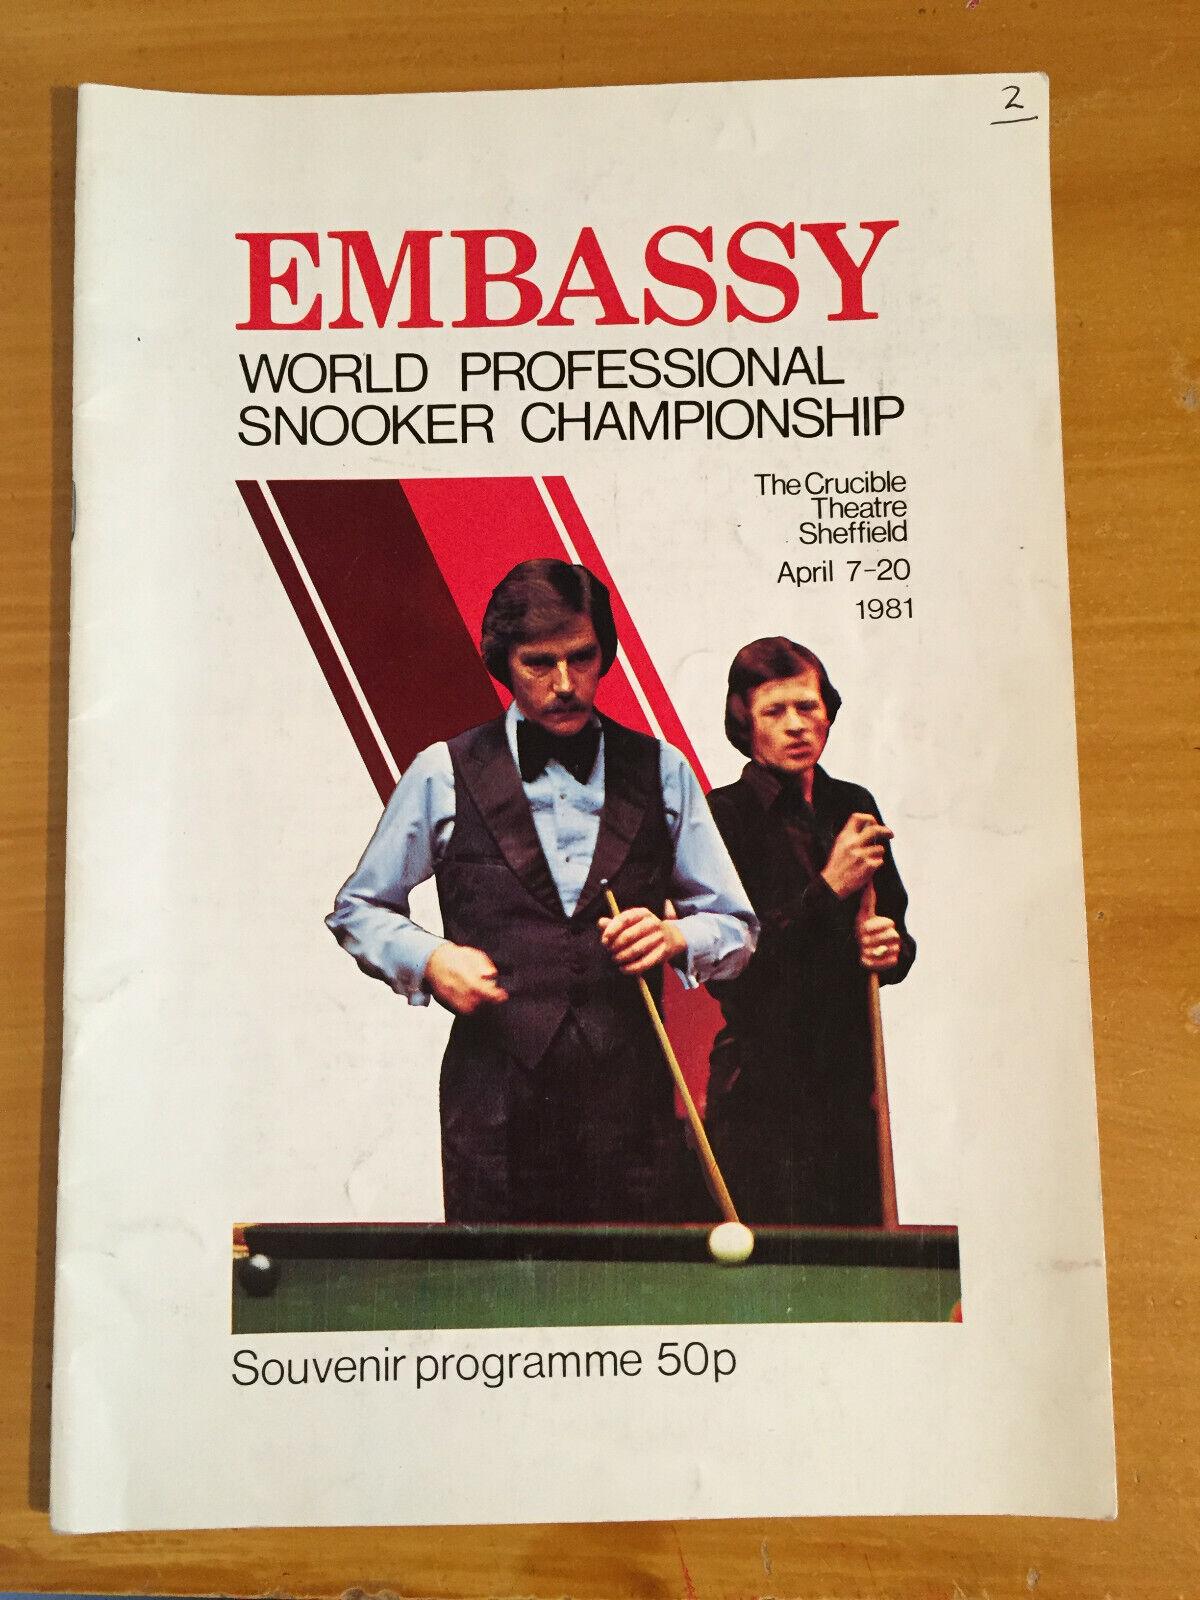 1981 Signed x 9 Embassy World Professional Snooker Championship Programme vgc